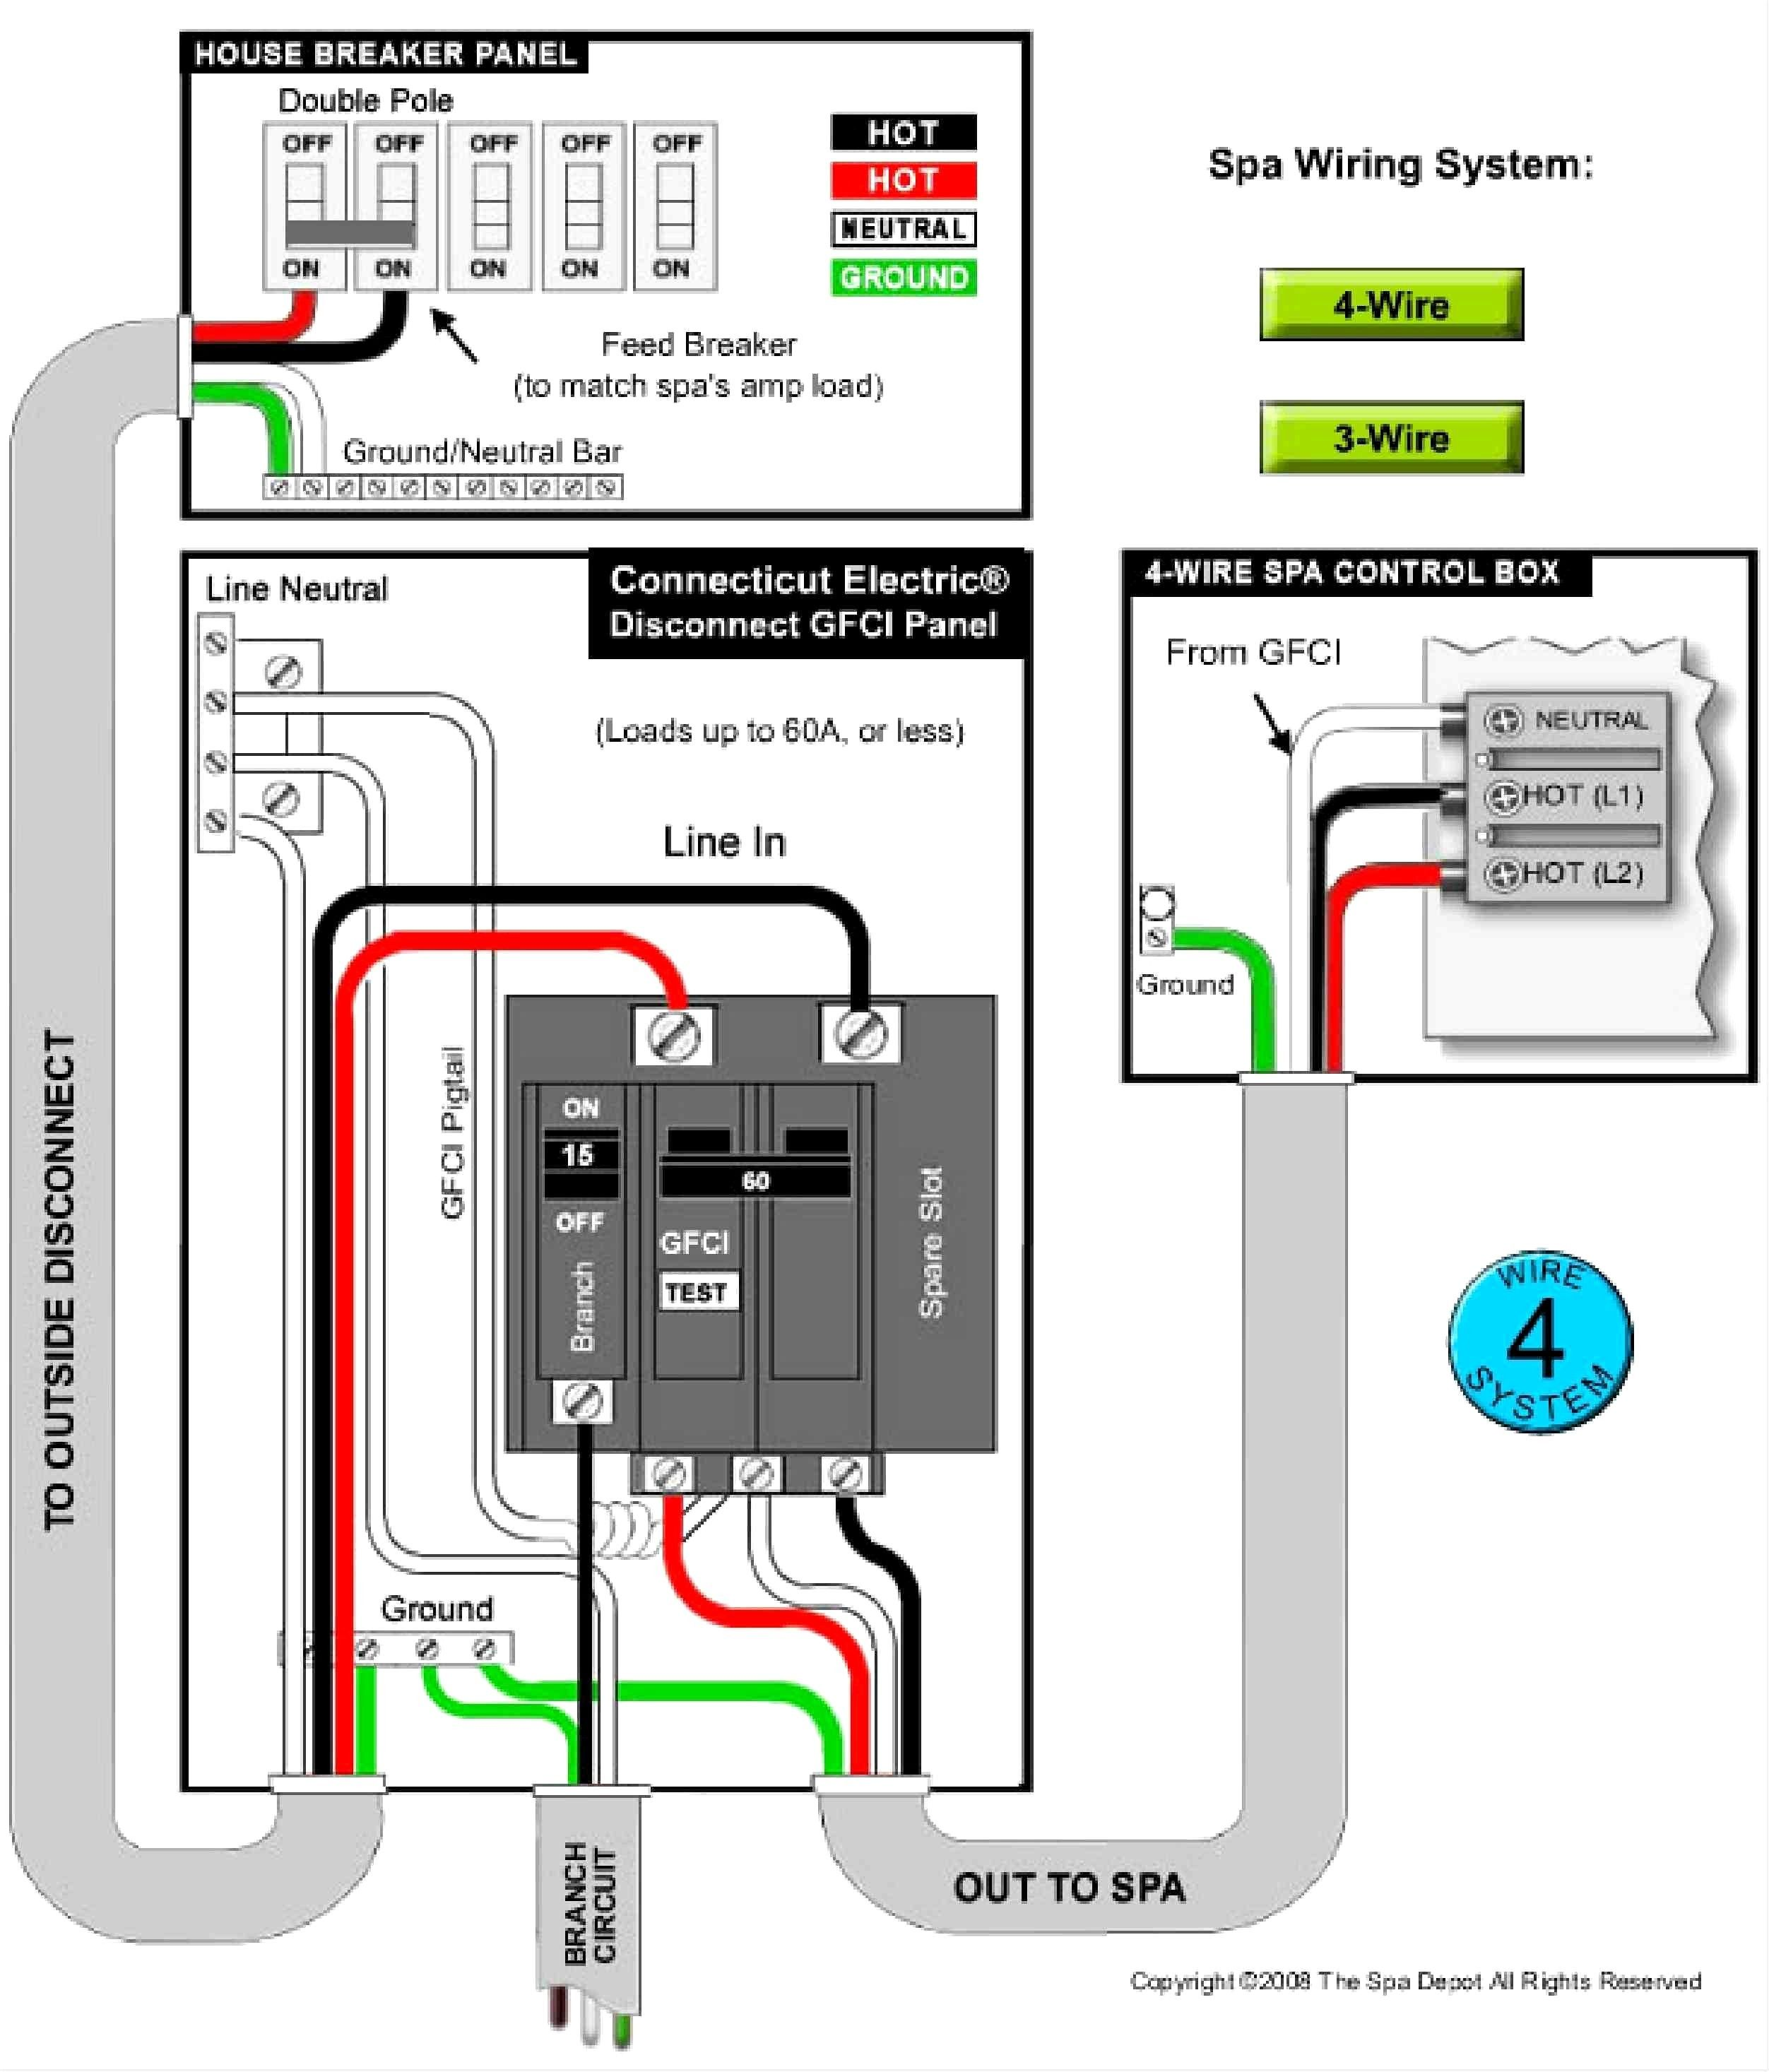 4 Wire 220v Wiring Diagram Hot Tub